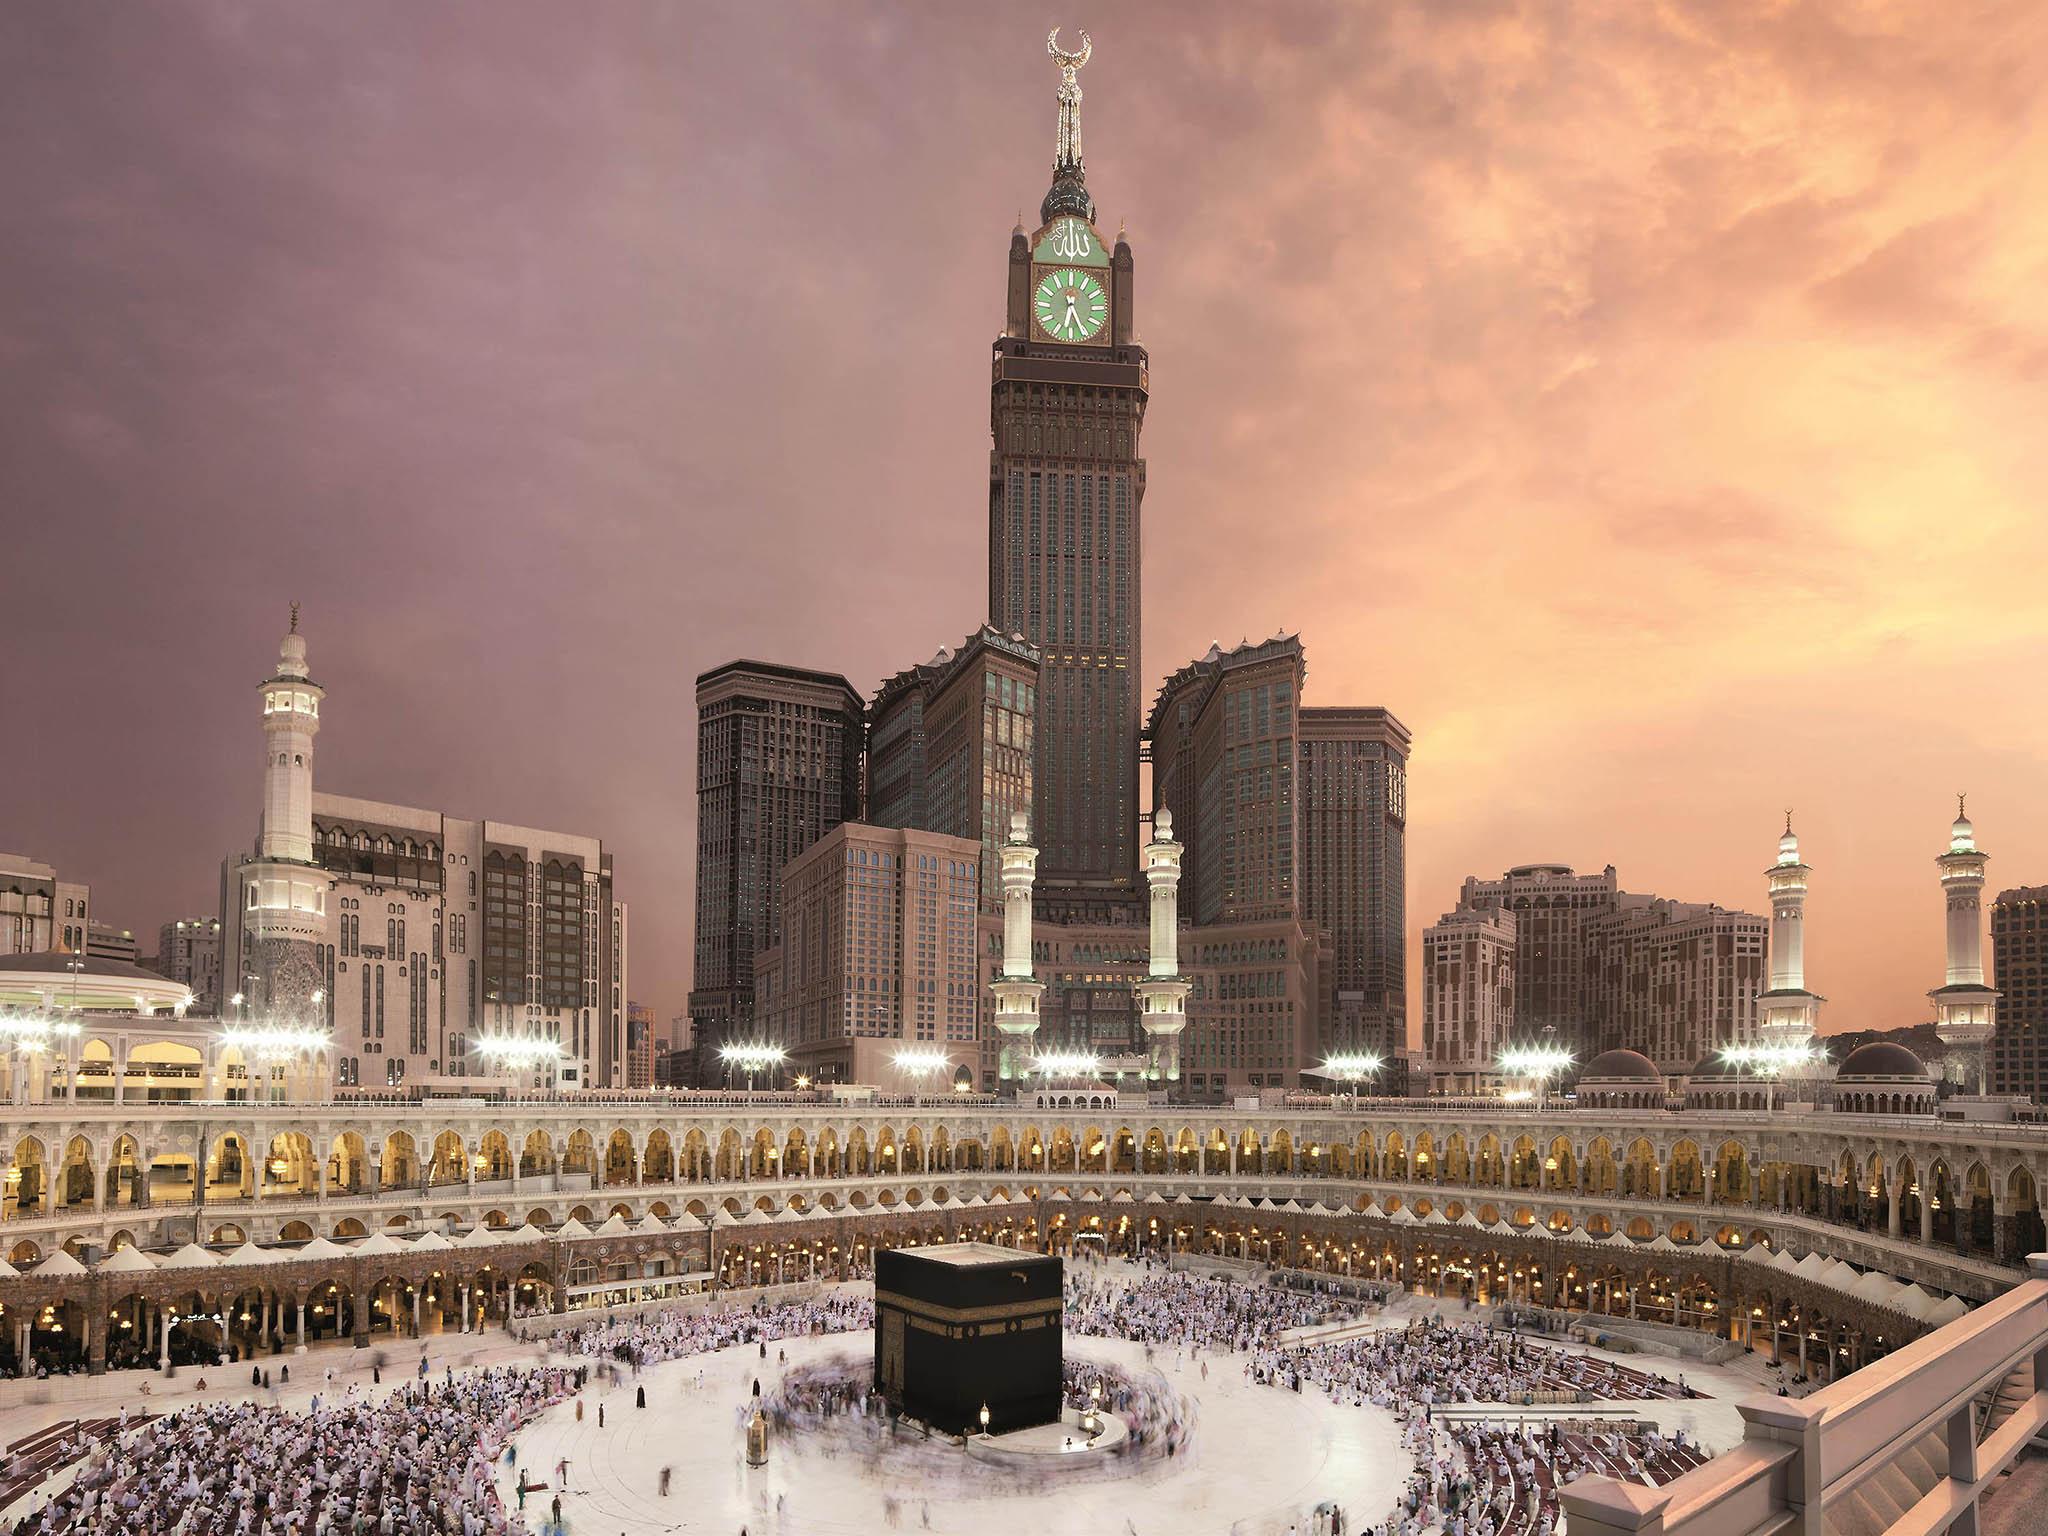 Hotel - Makkah Clock Royal Tower - Ein Fairmont Hotel